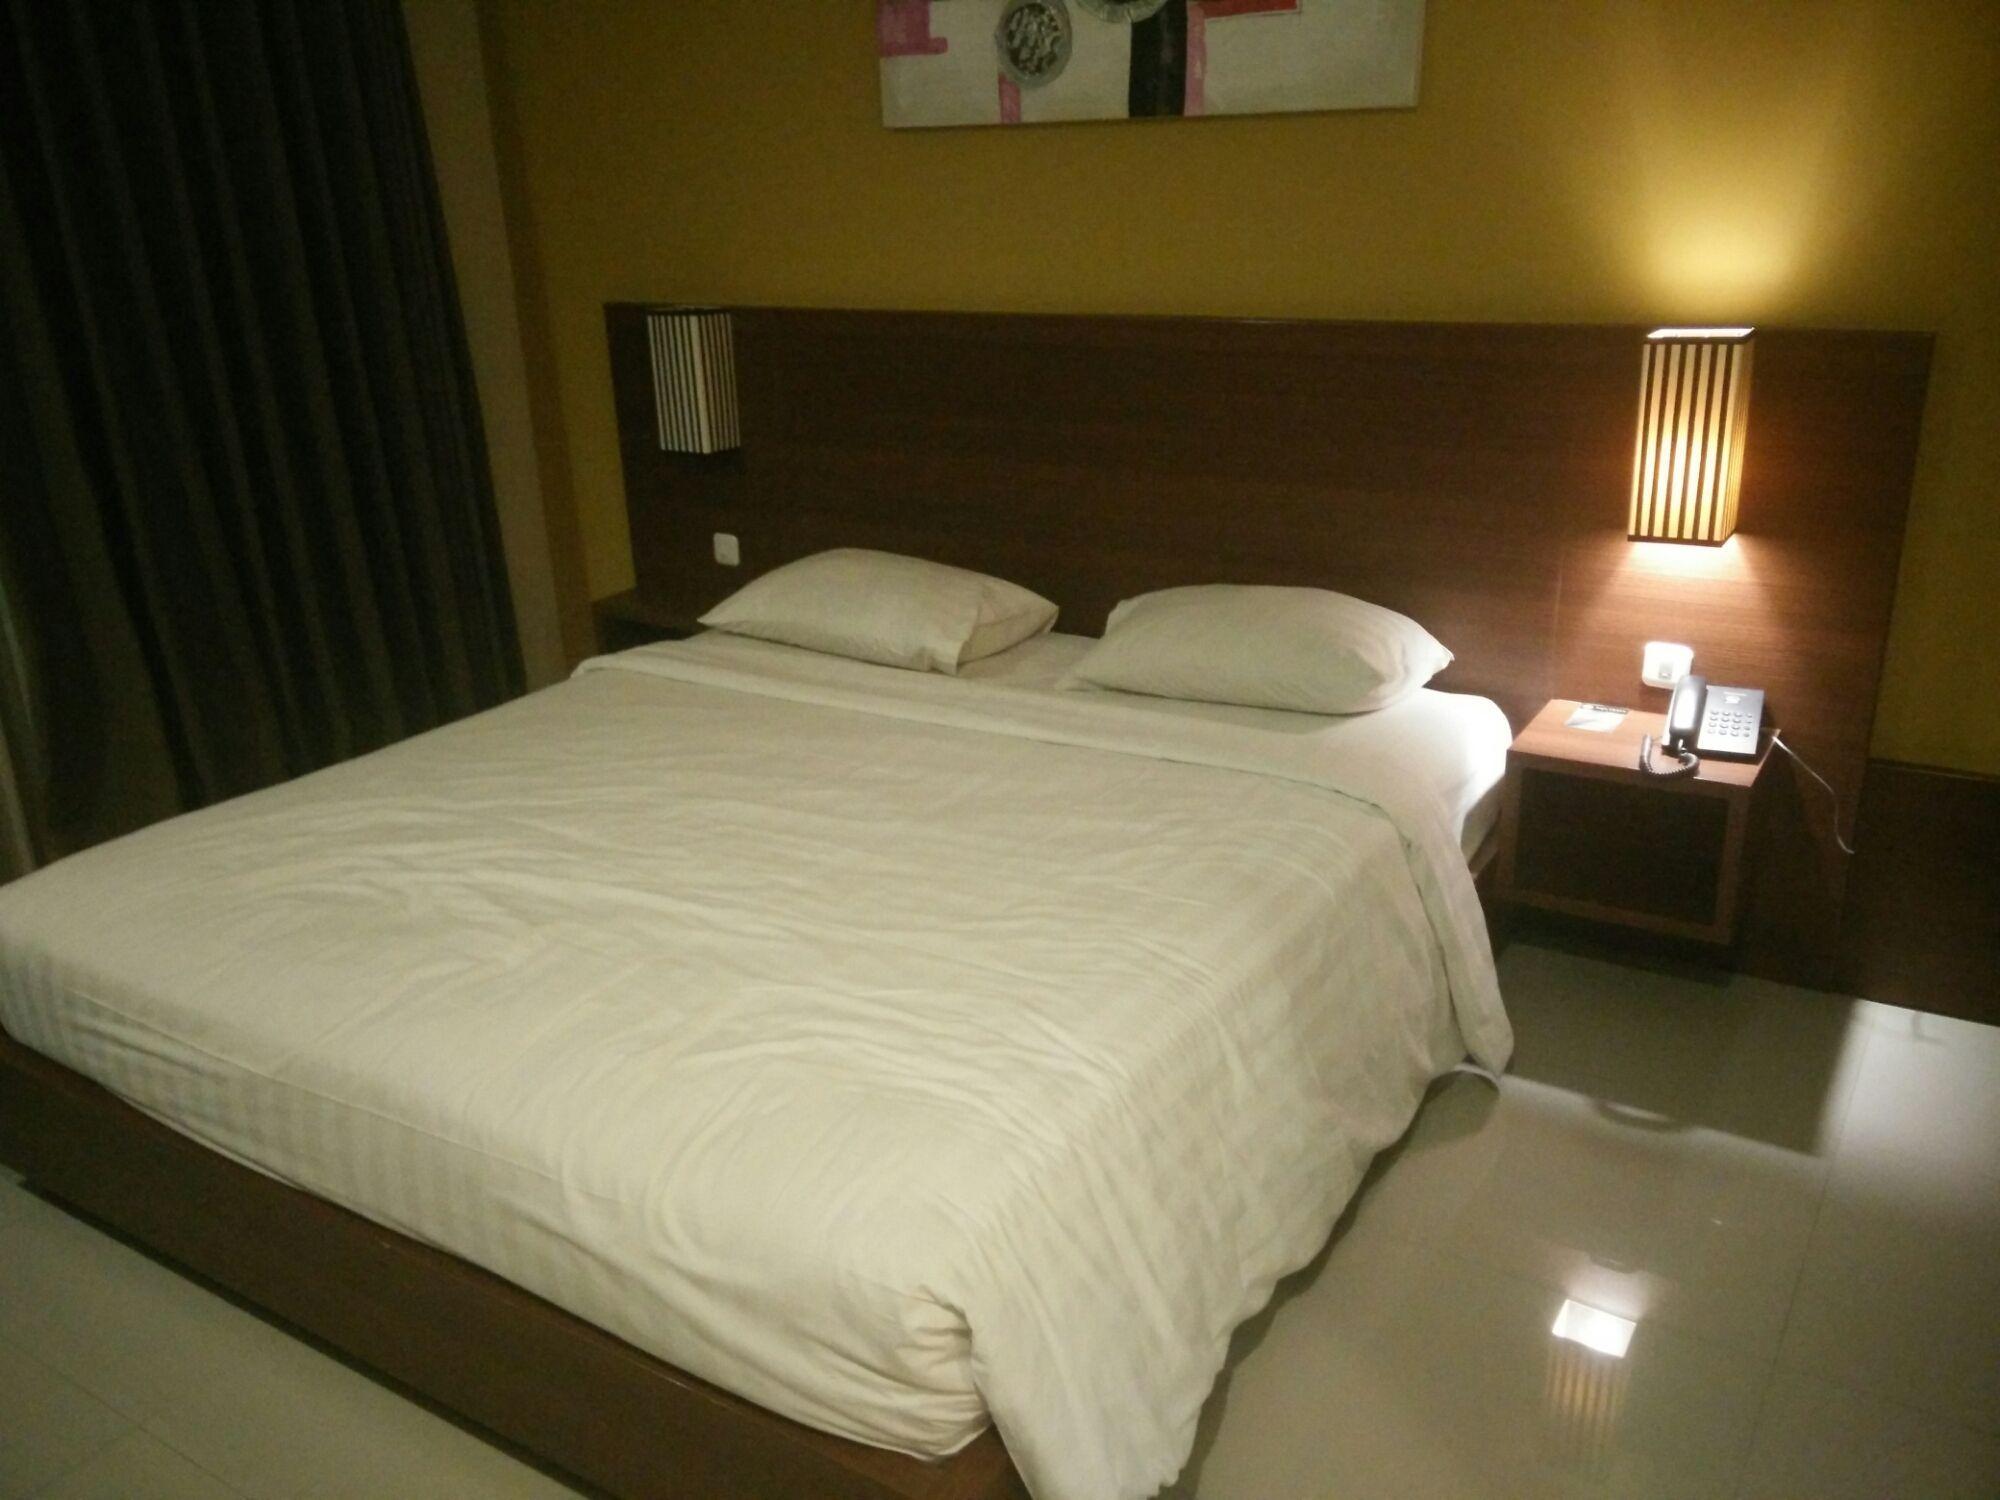 Cama doble king size en Hotel Bali Chaya